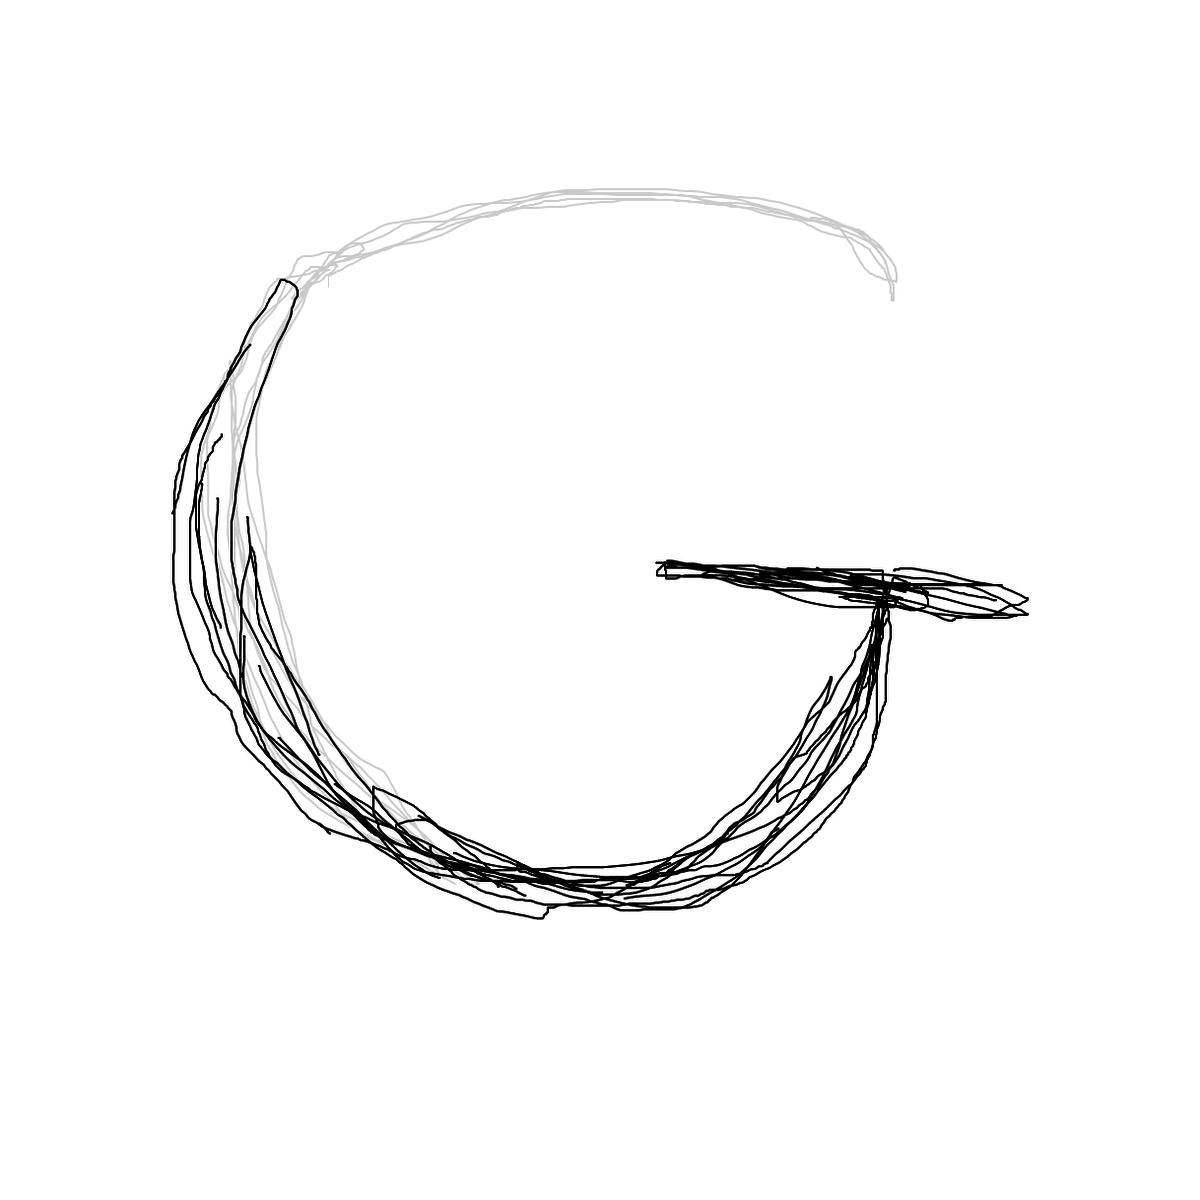 BAAAM drawing#14036 lat:-12.4005765914917000lng: 13.4566802978515620